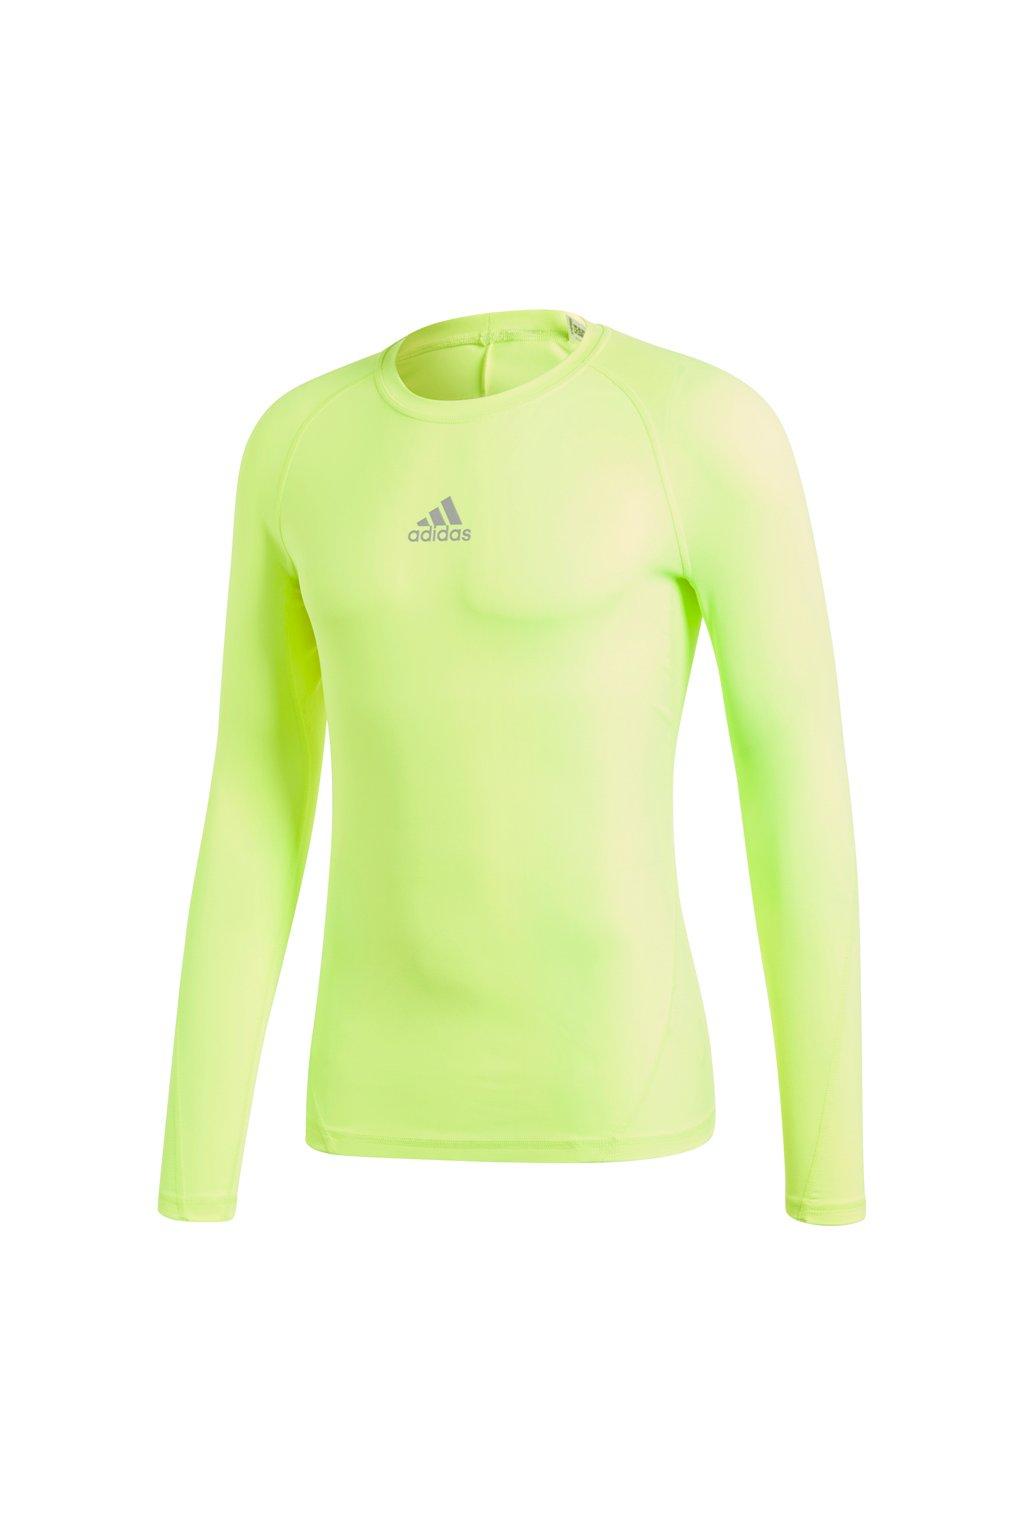 Pánske tričko Adidas Alphaskin Sport LS Tee žltá CW9509